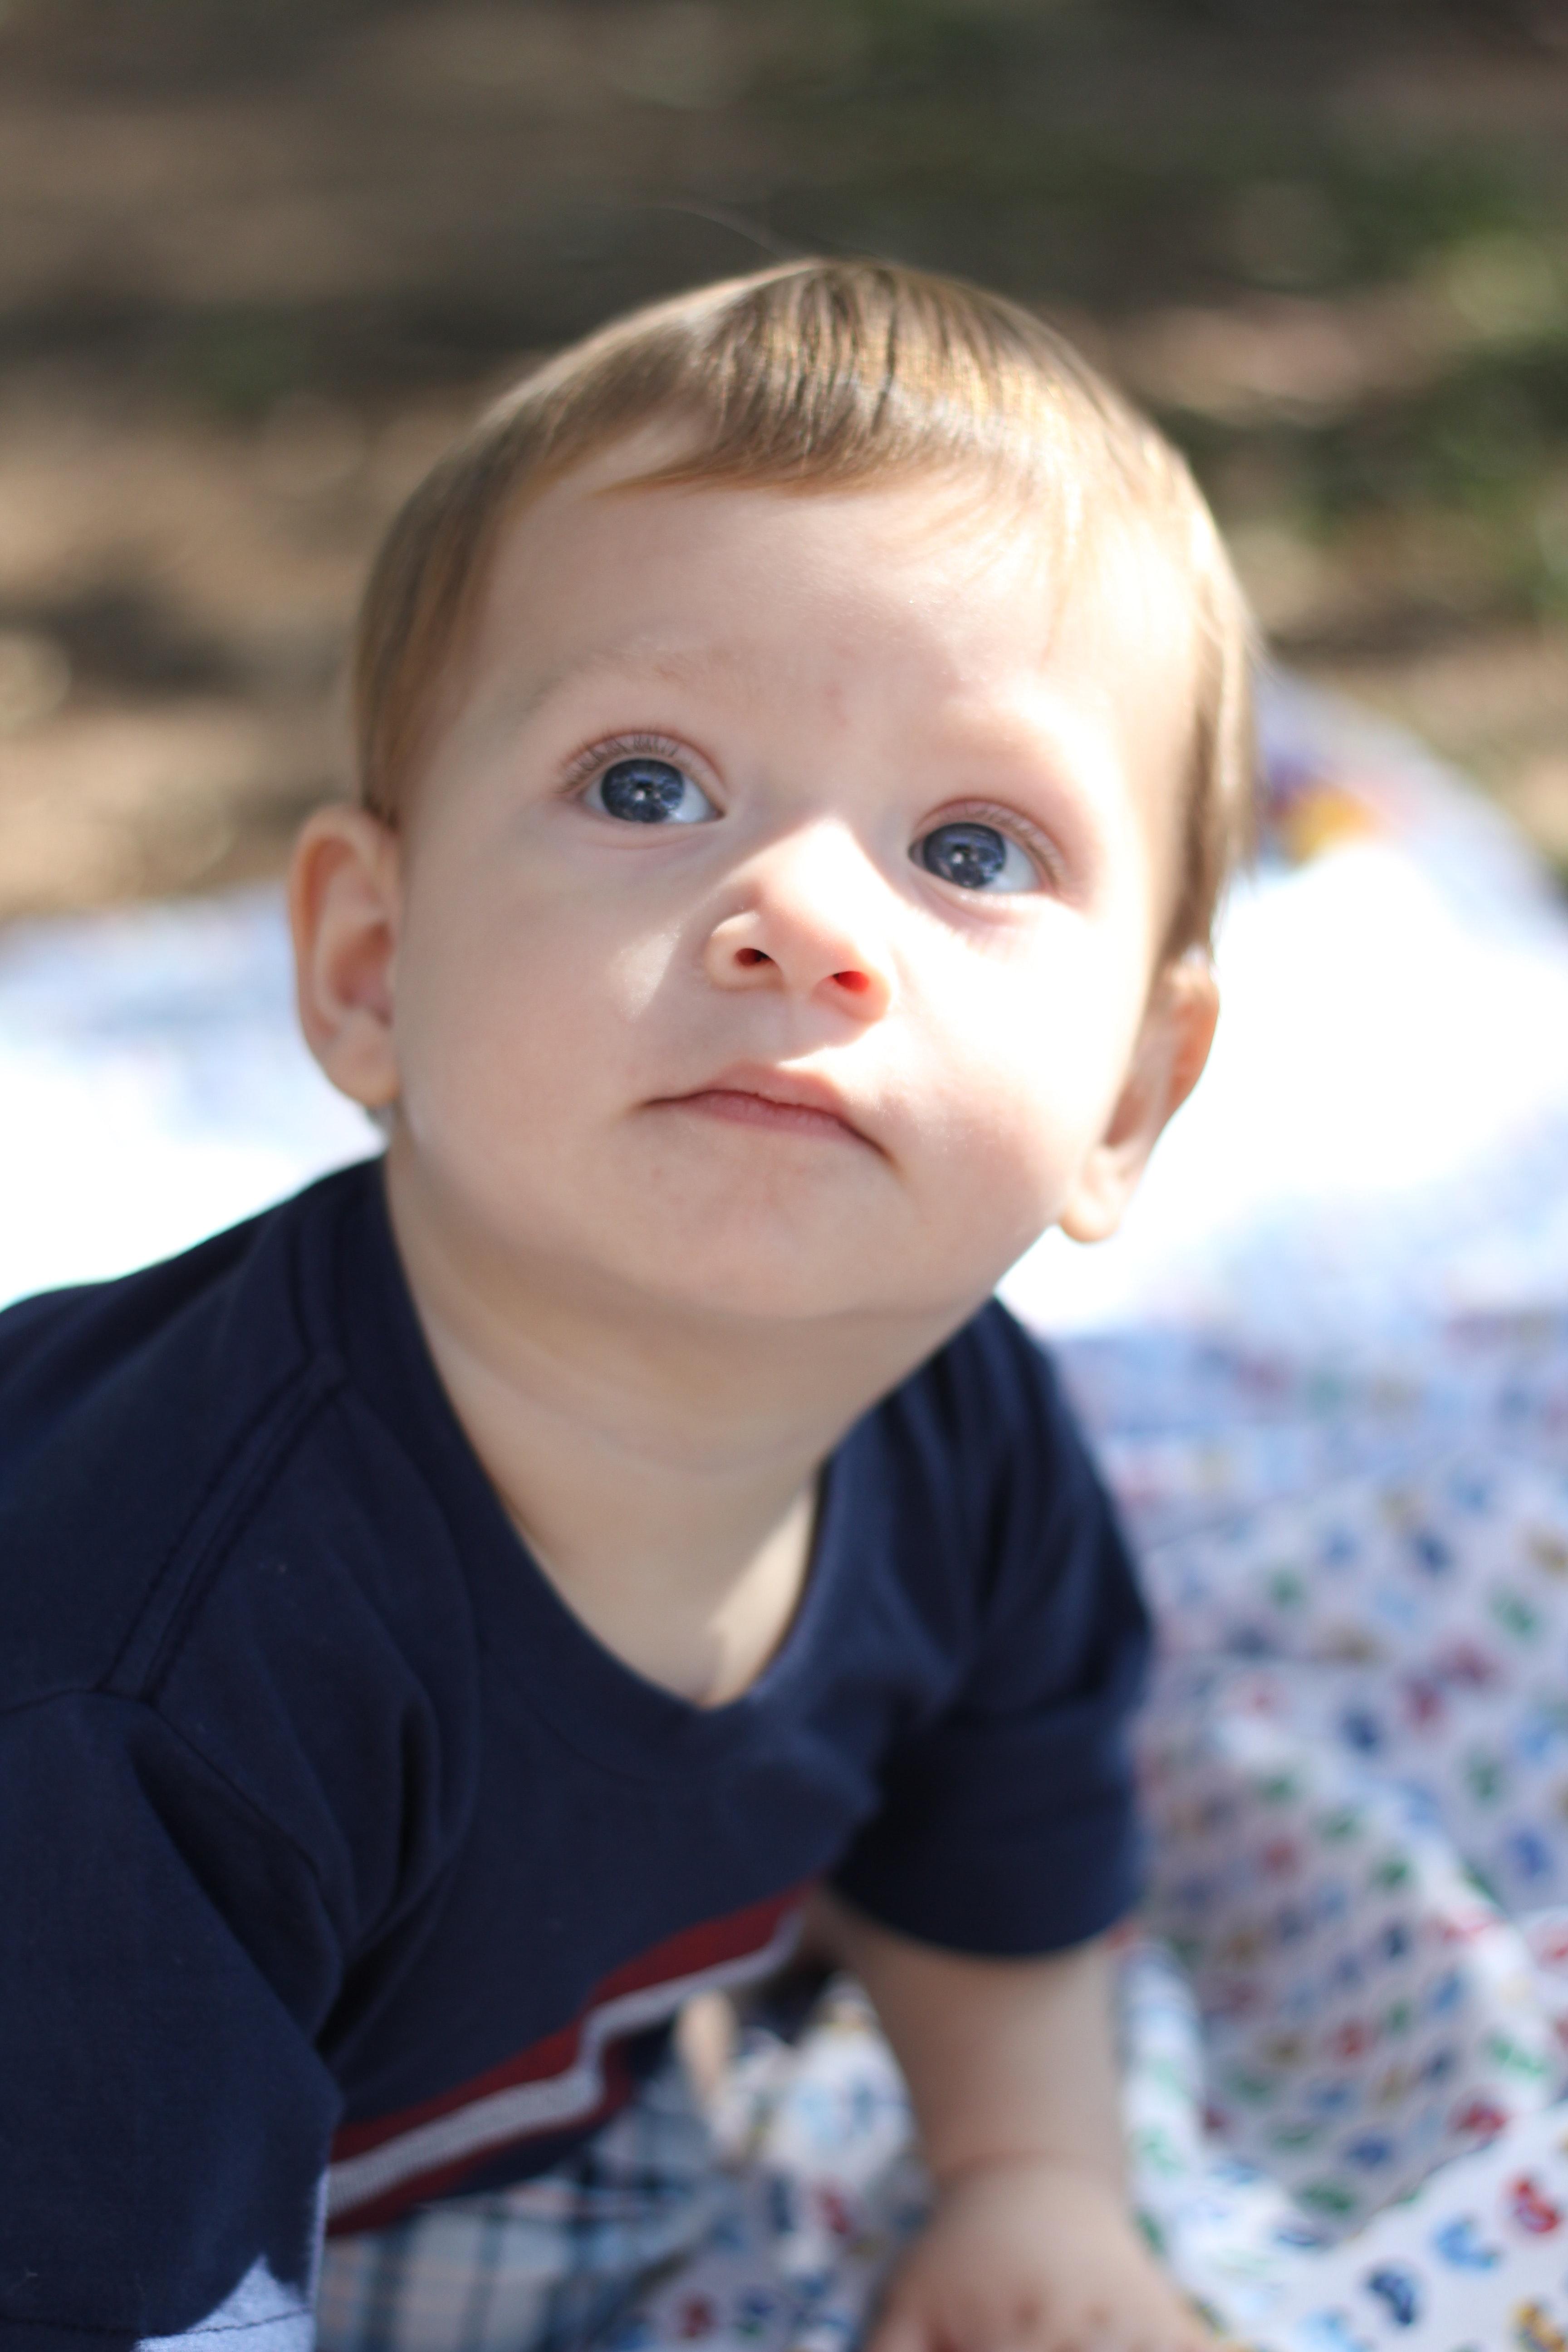 free stock photo of baby, baby boy, blue